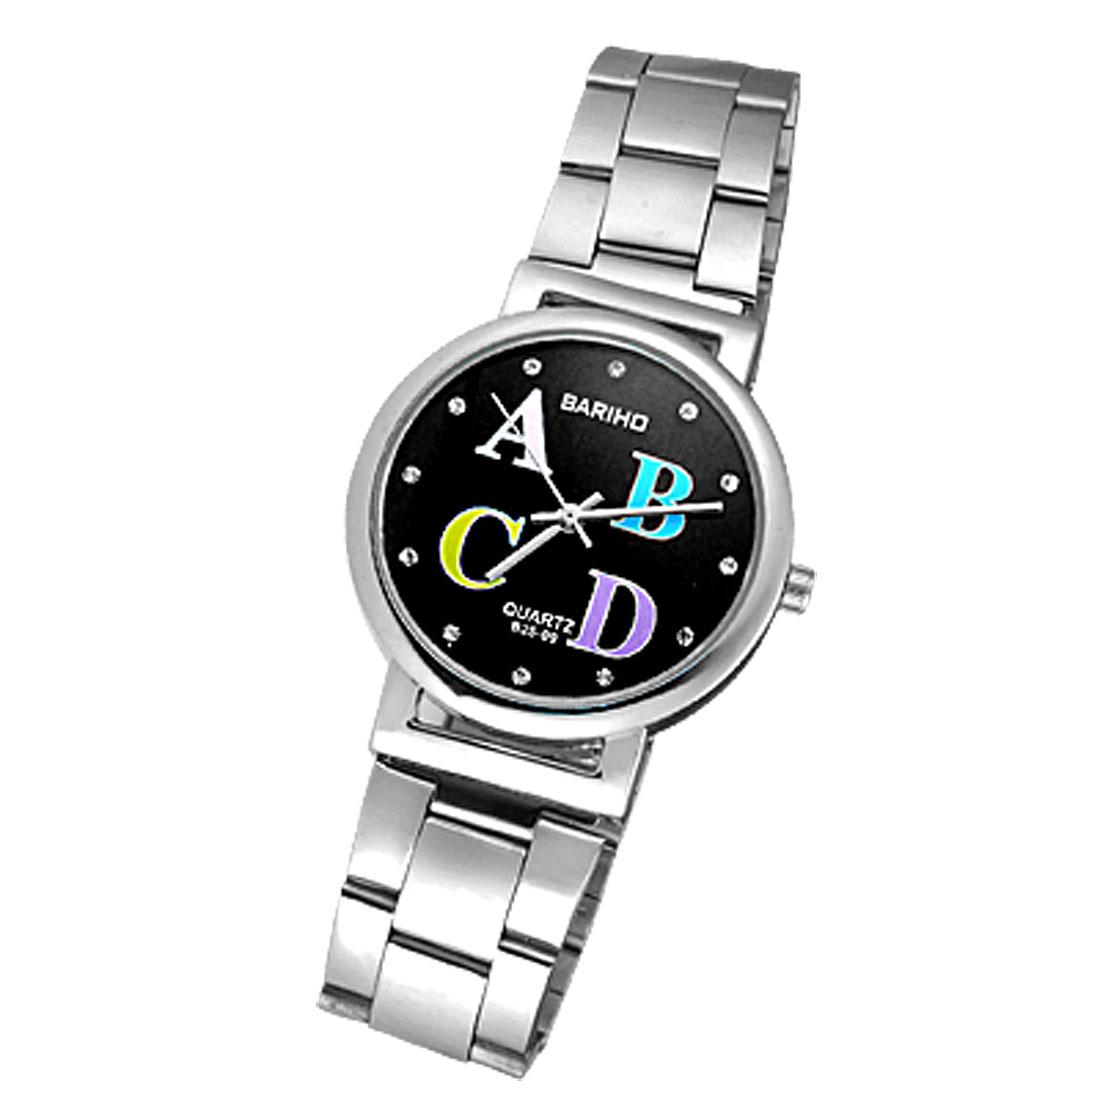 Exquisite Rhinestone Black Dial Alloy Men's Watch